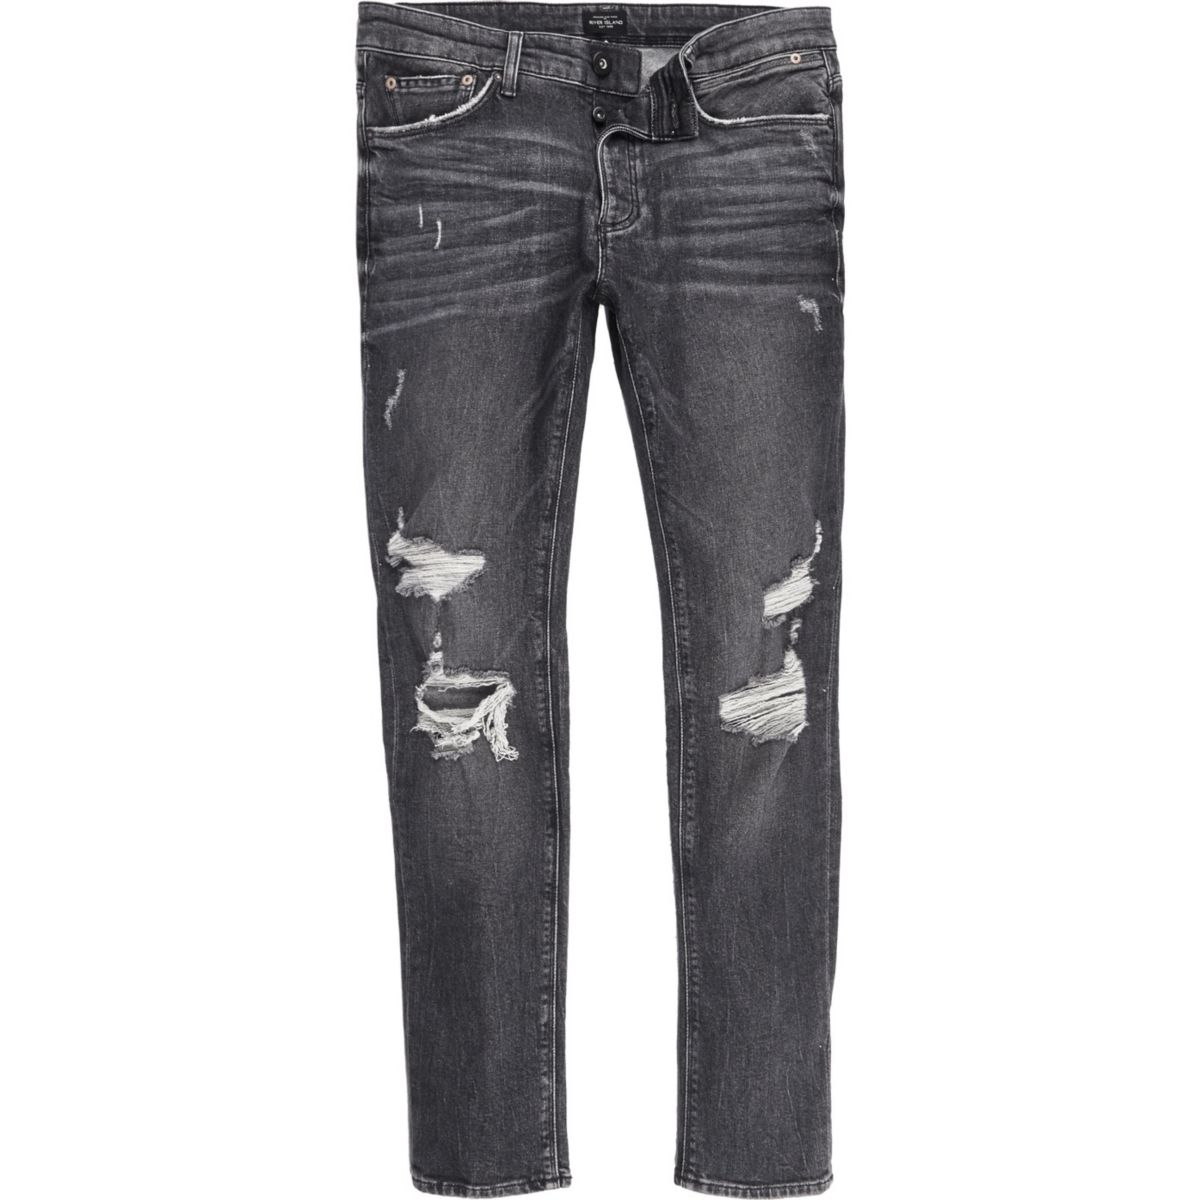 Black ripped Sid skinny jeans